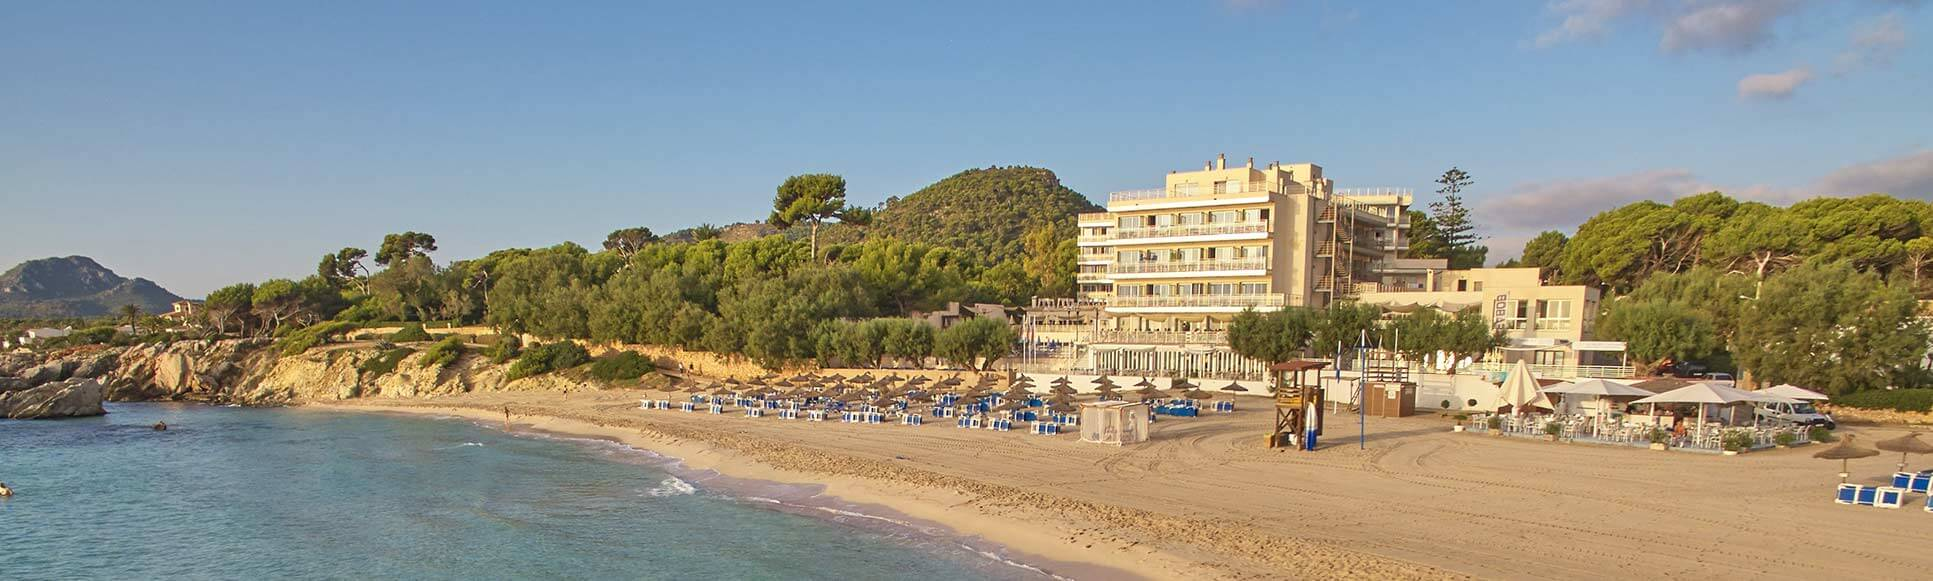 Hotel Na Forana Playa Mallorca